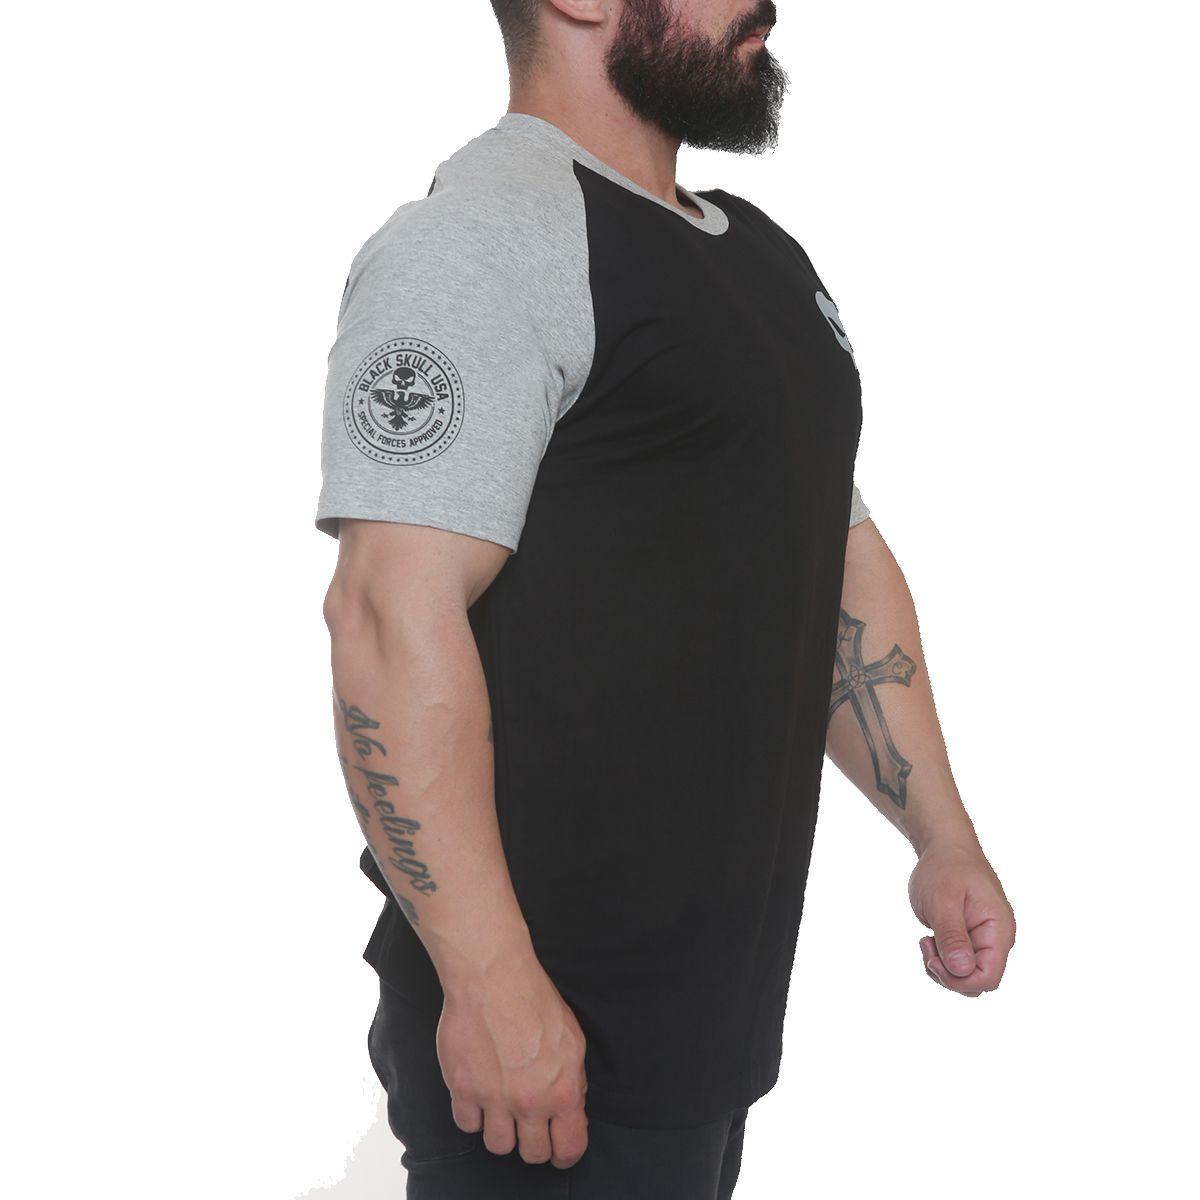 Camiseta Skull Army Preto - Black Skull